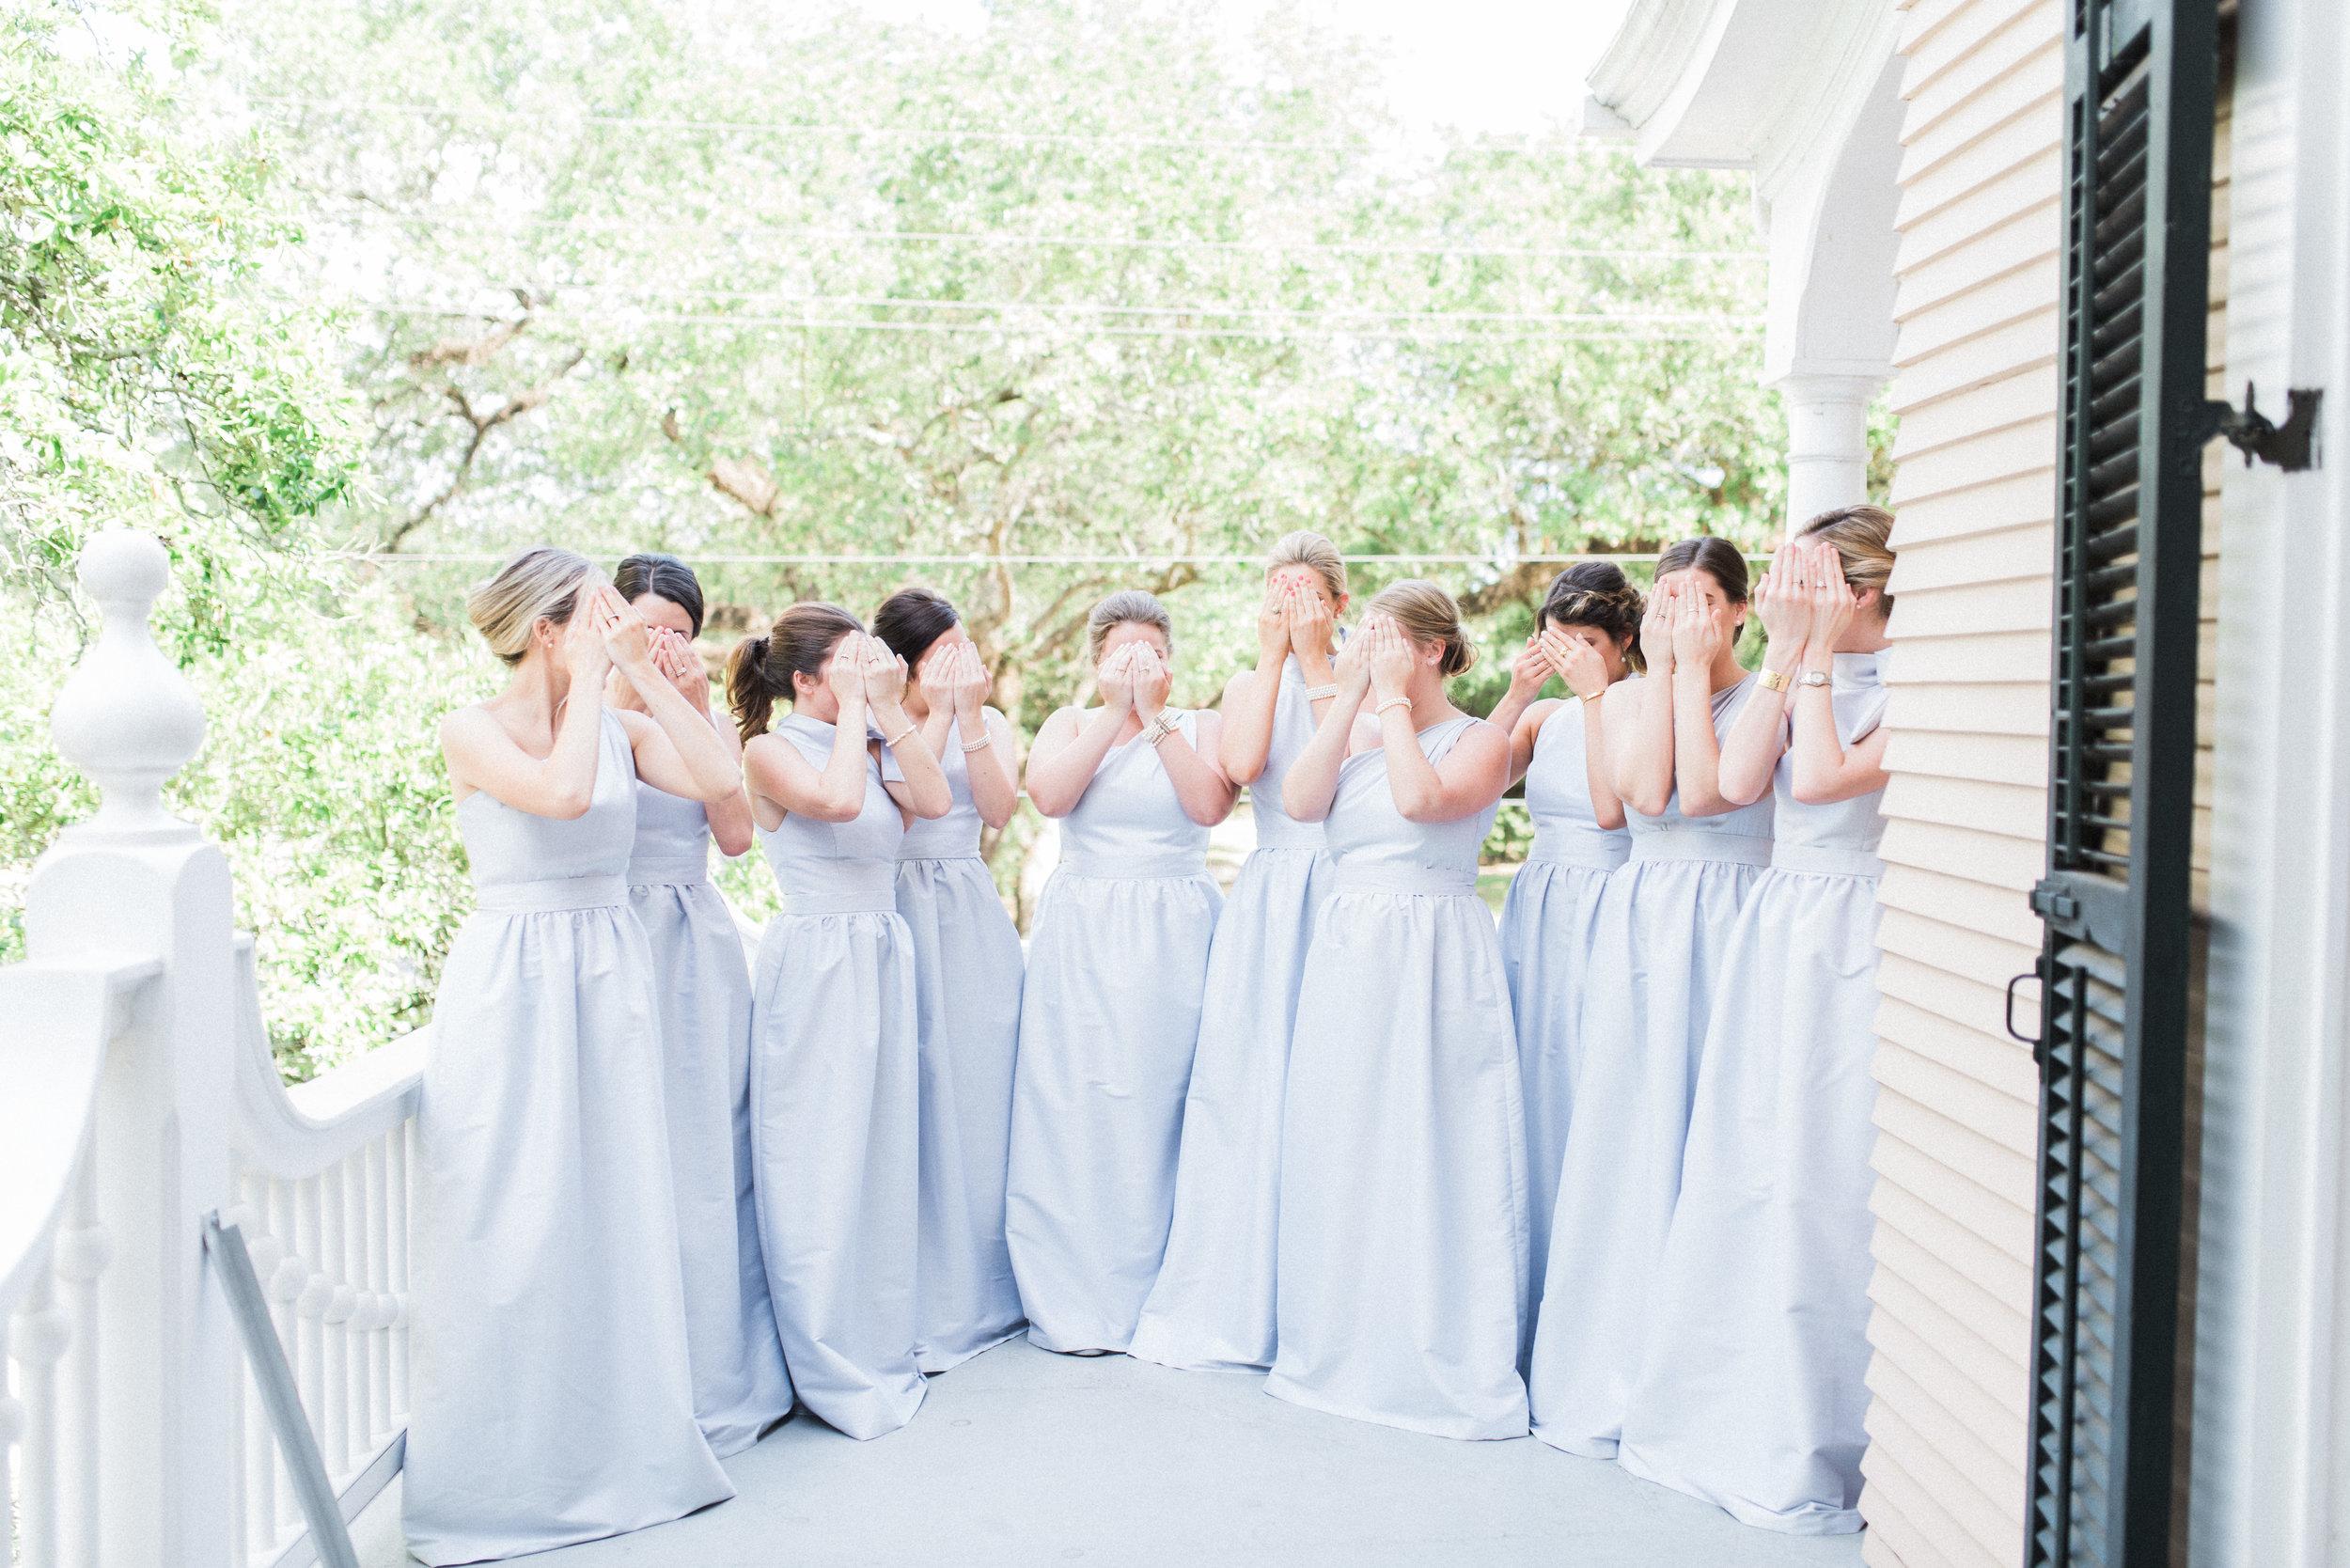 Southern Fete, Southern Wedding, Bridesmaids, Light Blue Bridesmaid dresses